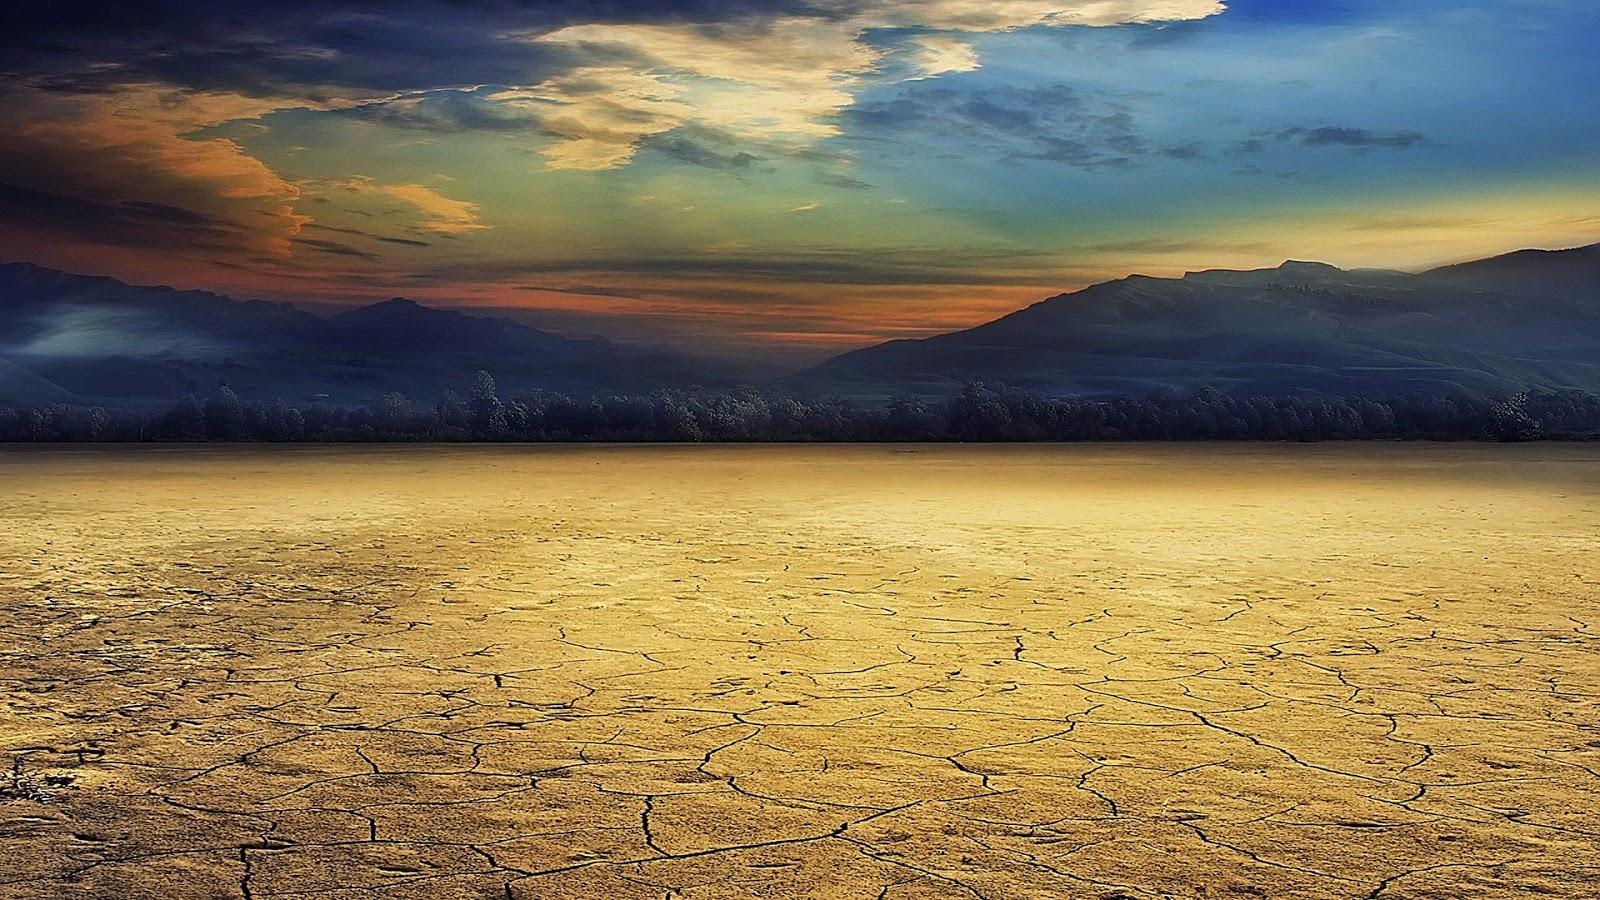 O que é o deserto?